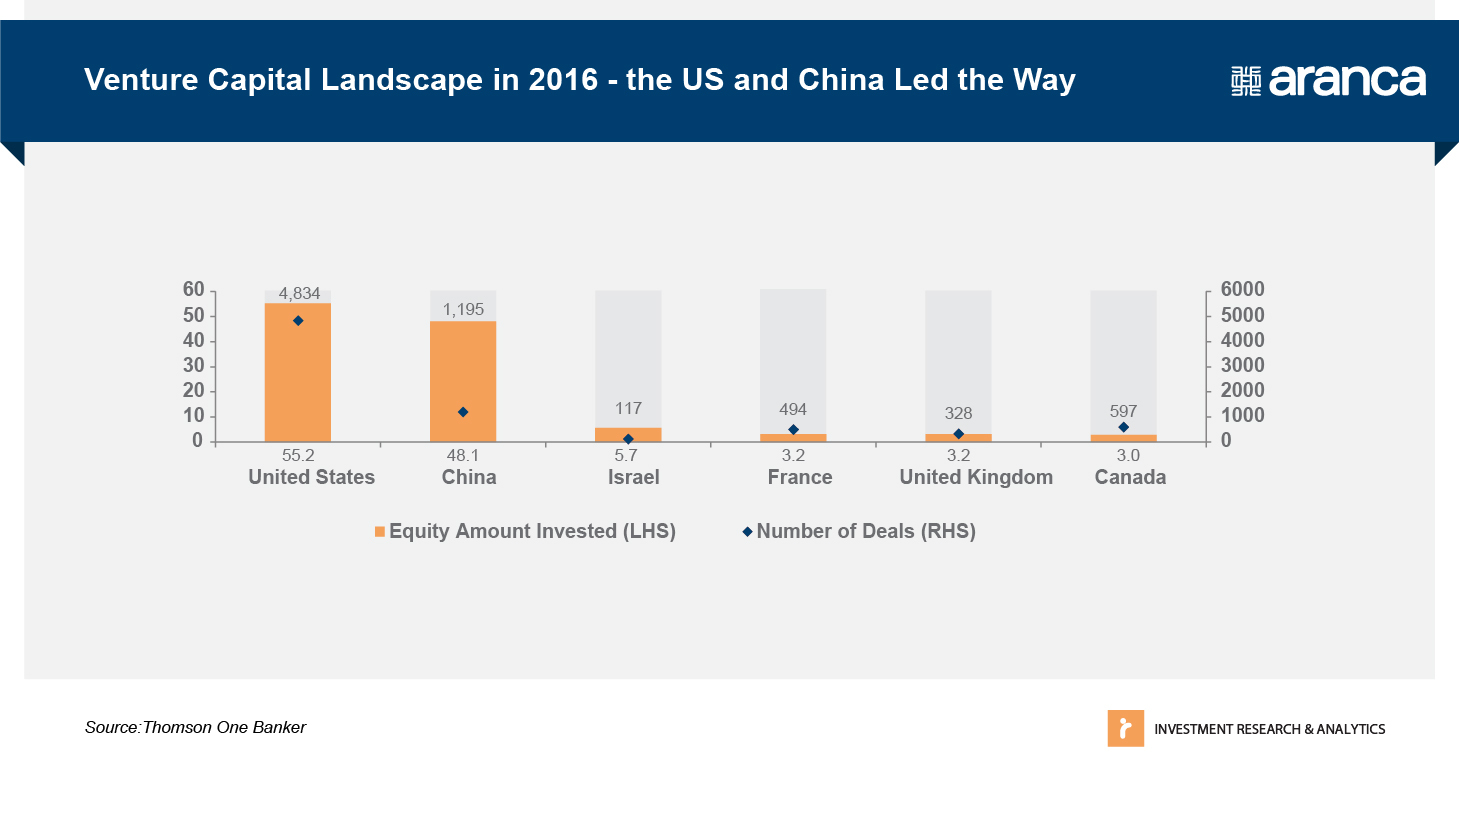 7c3f7faeb Venture Capital Landscape 2016